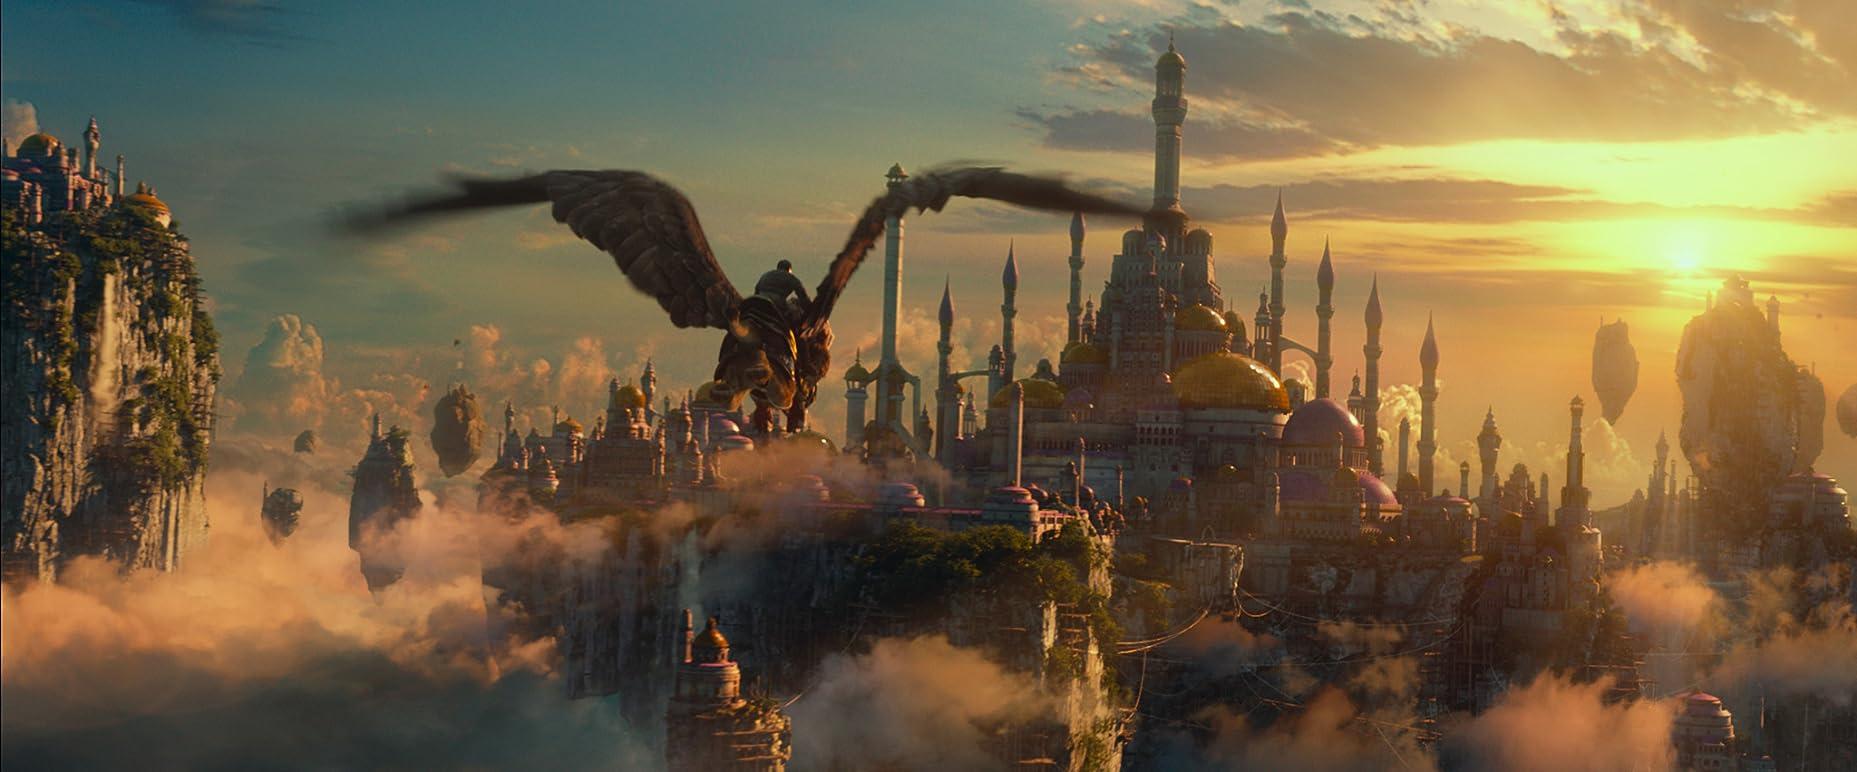 Legendary Pictures' Warcraft - Trailer 8